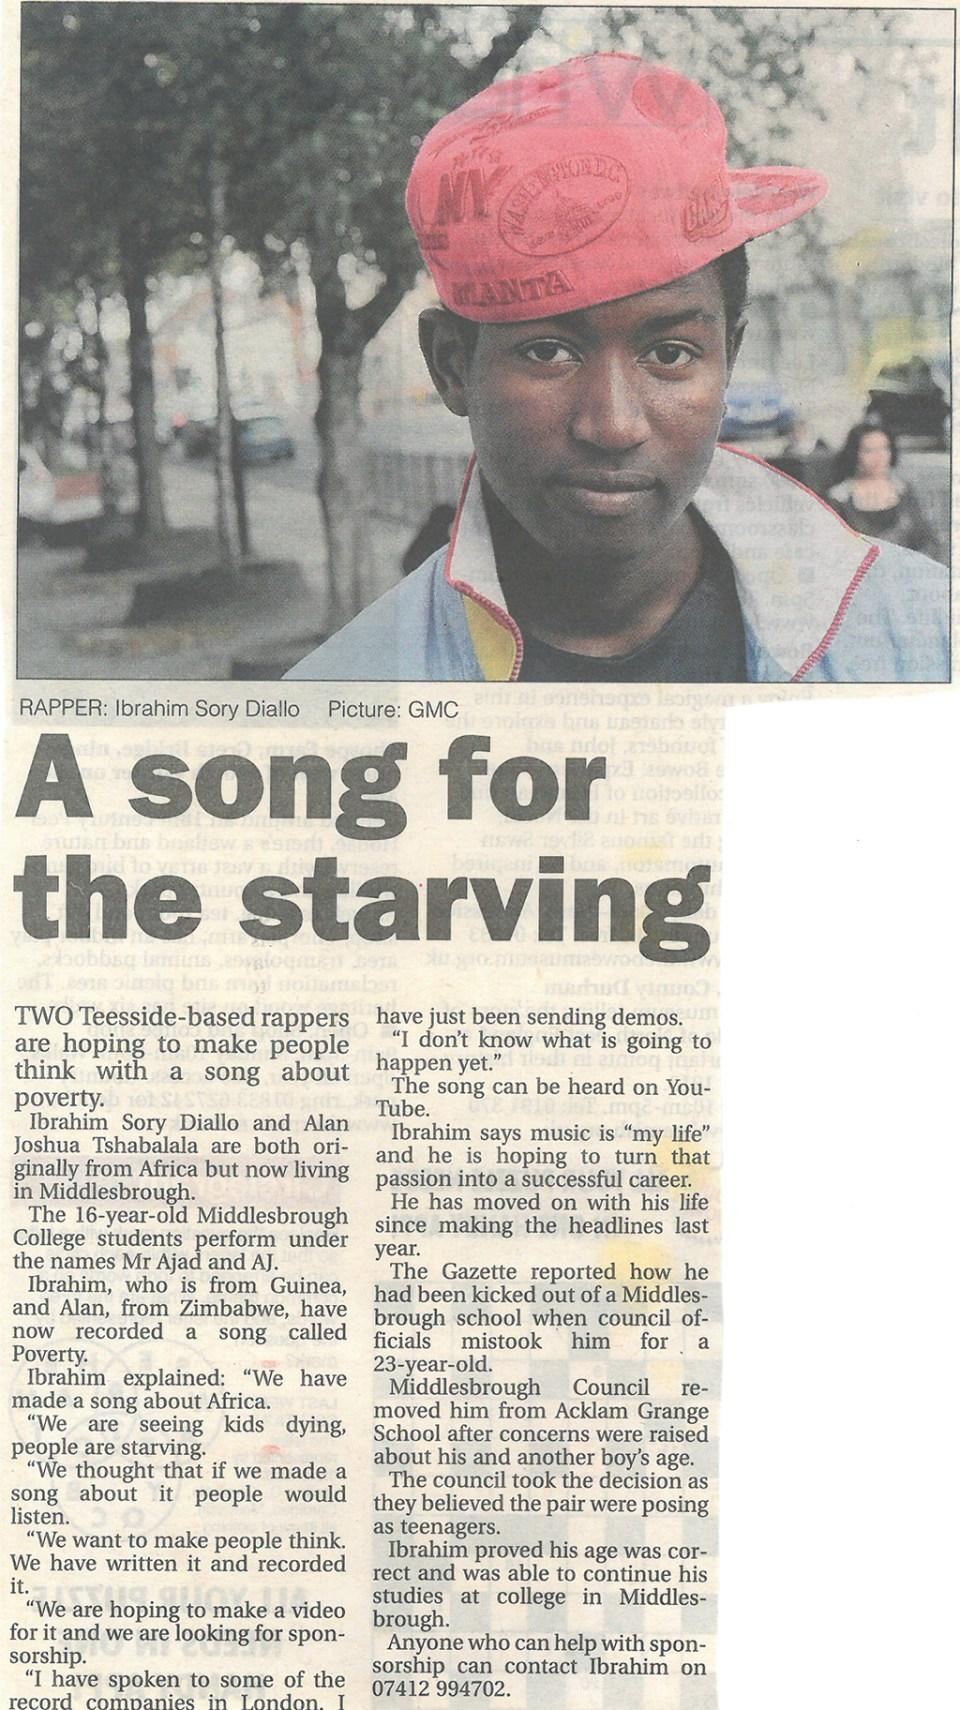 2011-12-01, Herald & Post